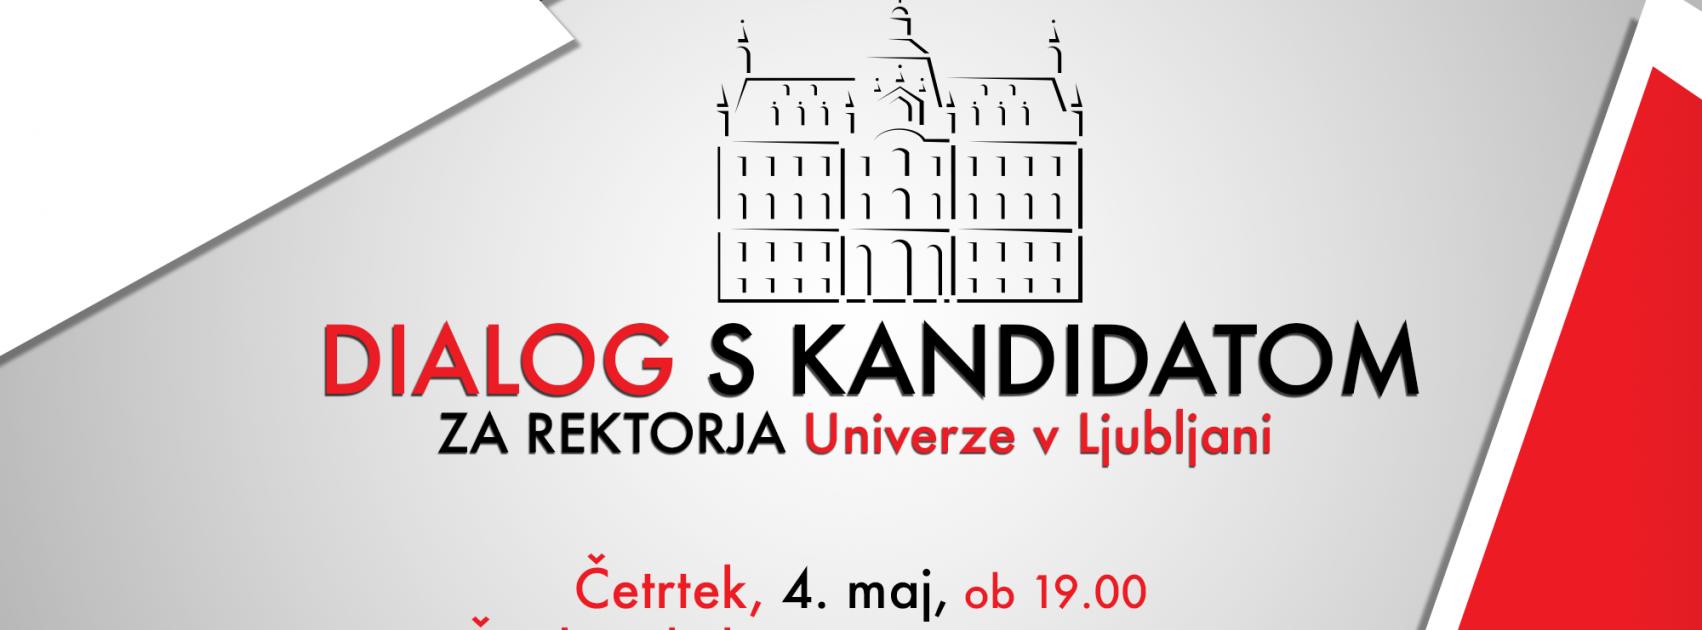 cover_dialog_ok_2.png